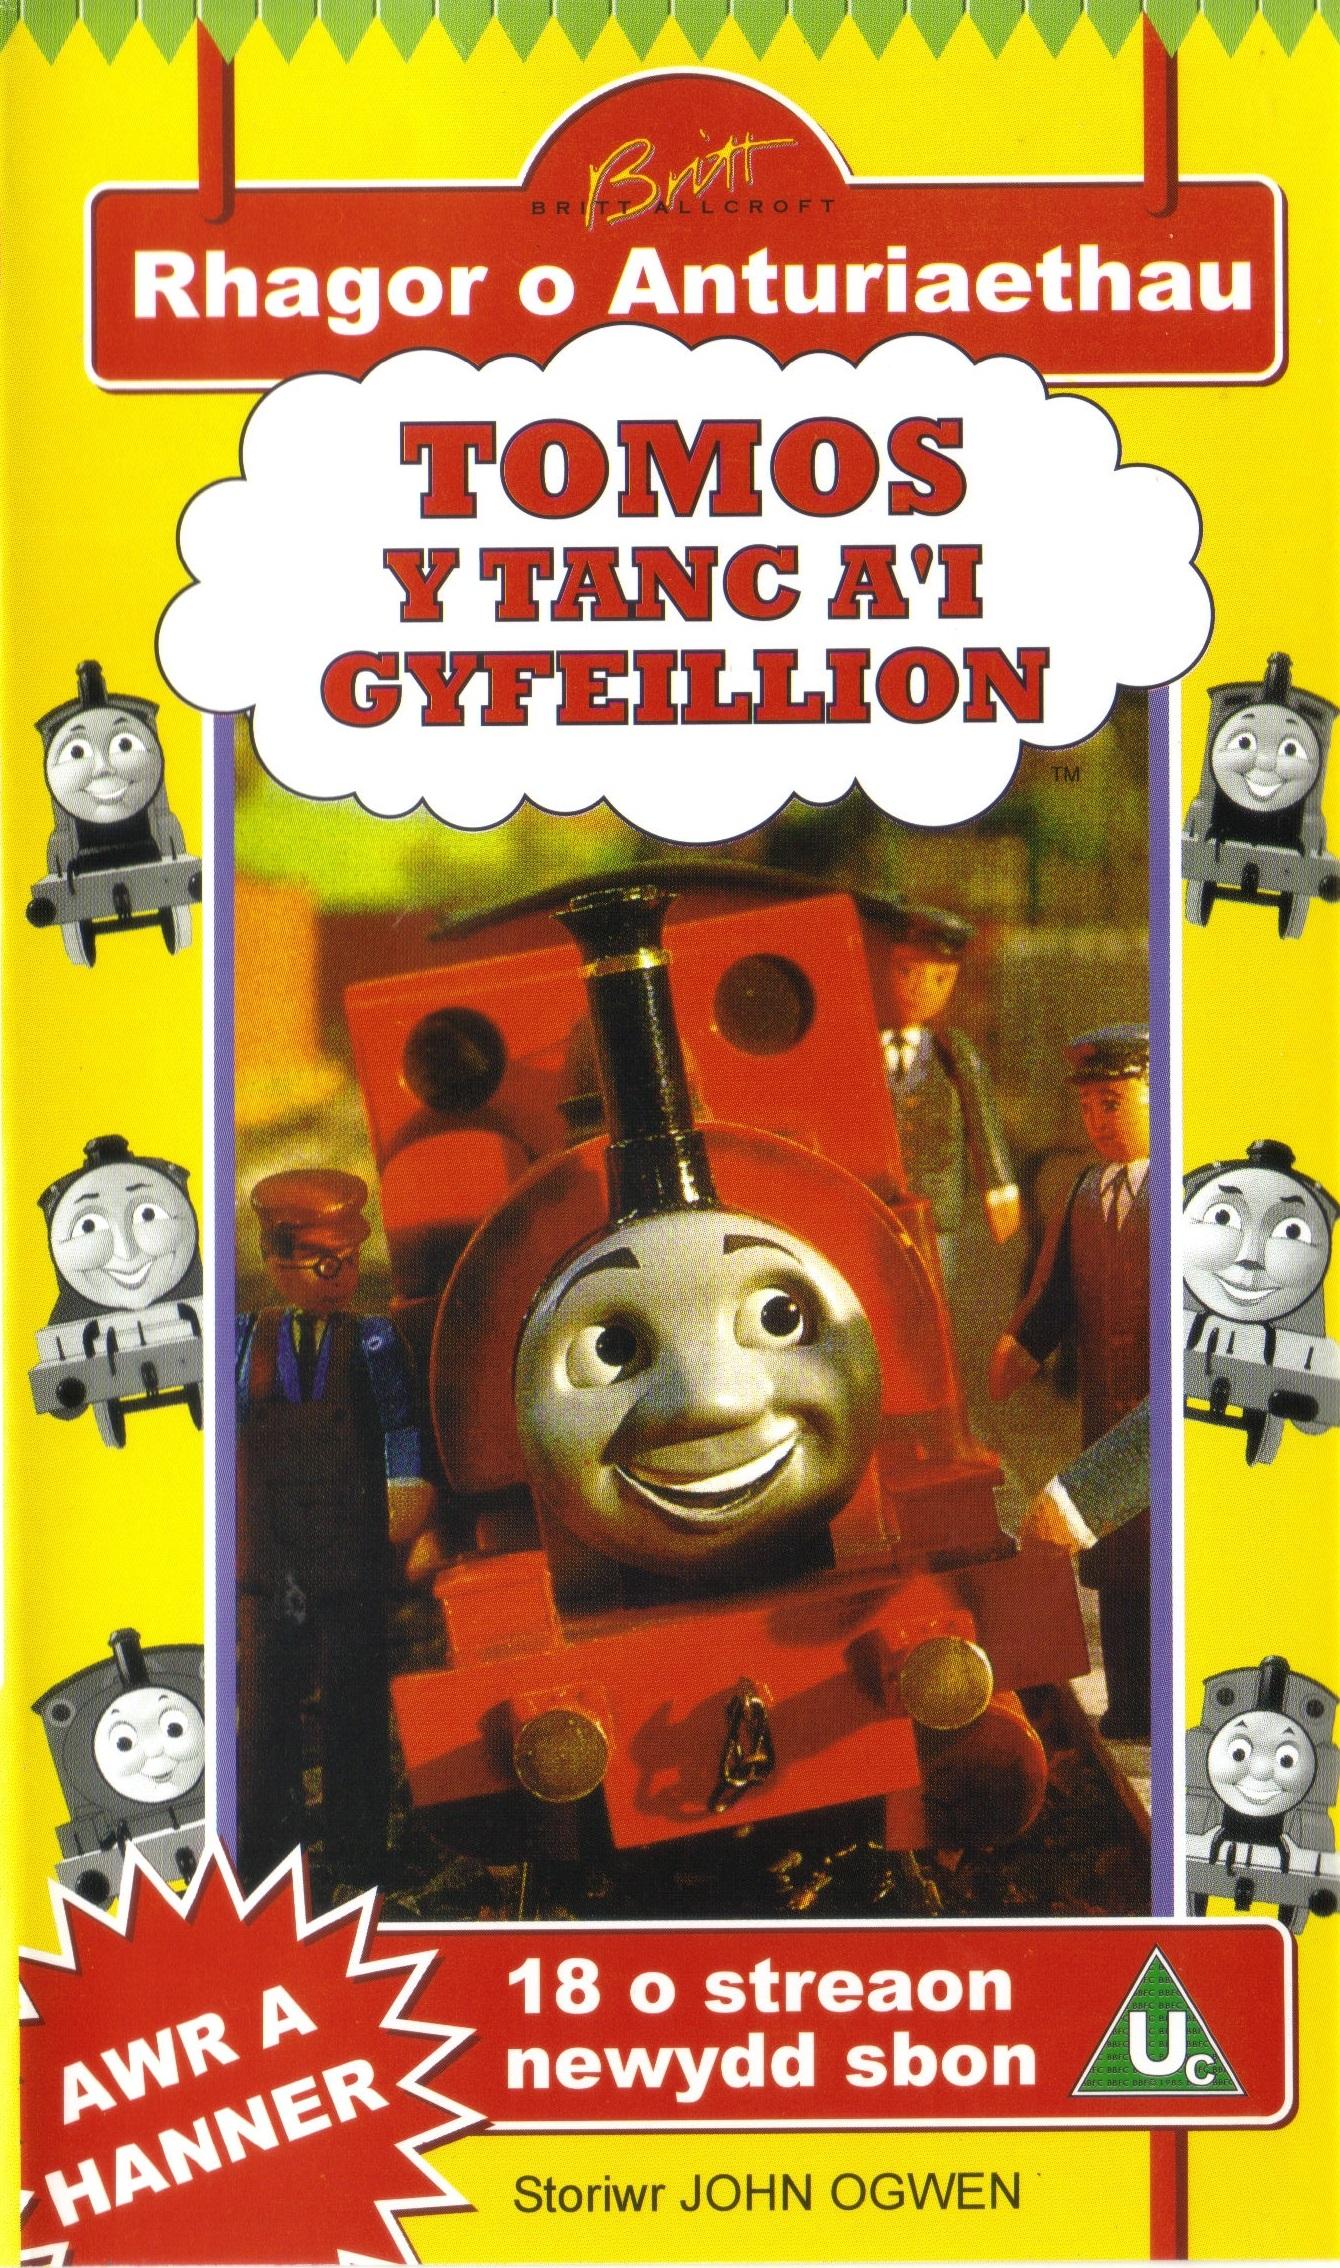 Thomas the Tank Engine: Bumper Special 2 | Thomas the Tank Engine Wikia | FANDOM powered by Wikia